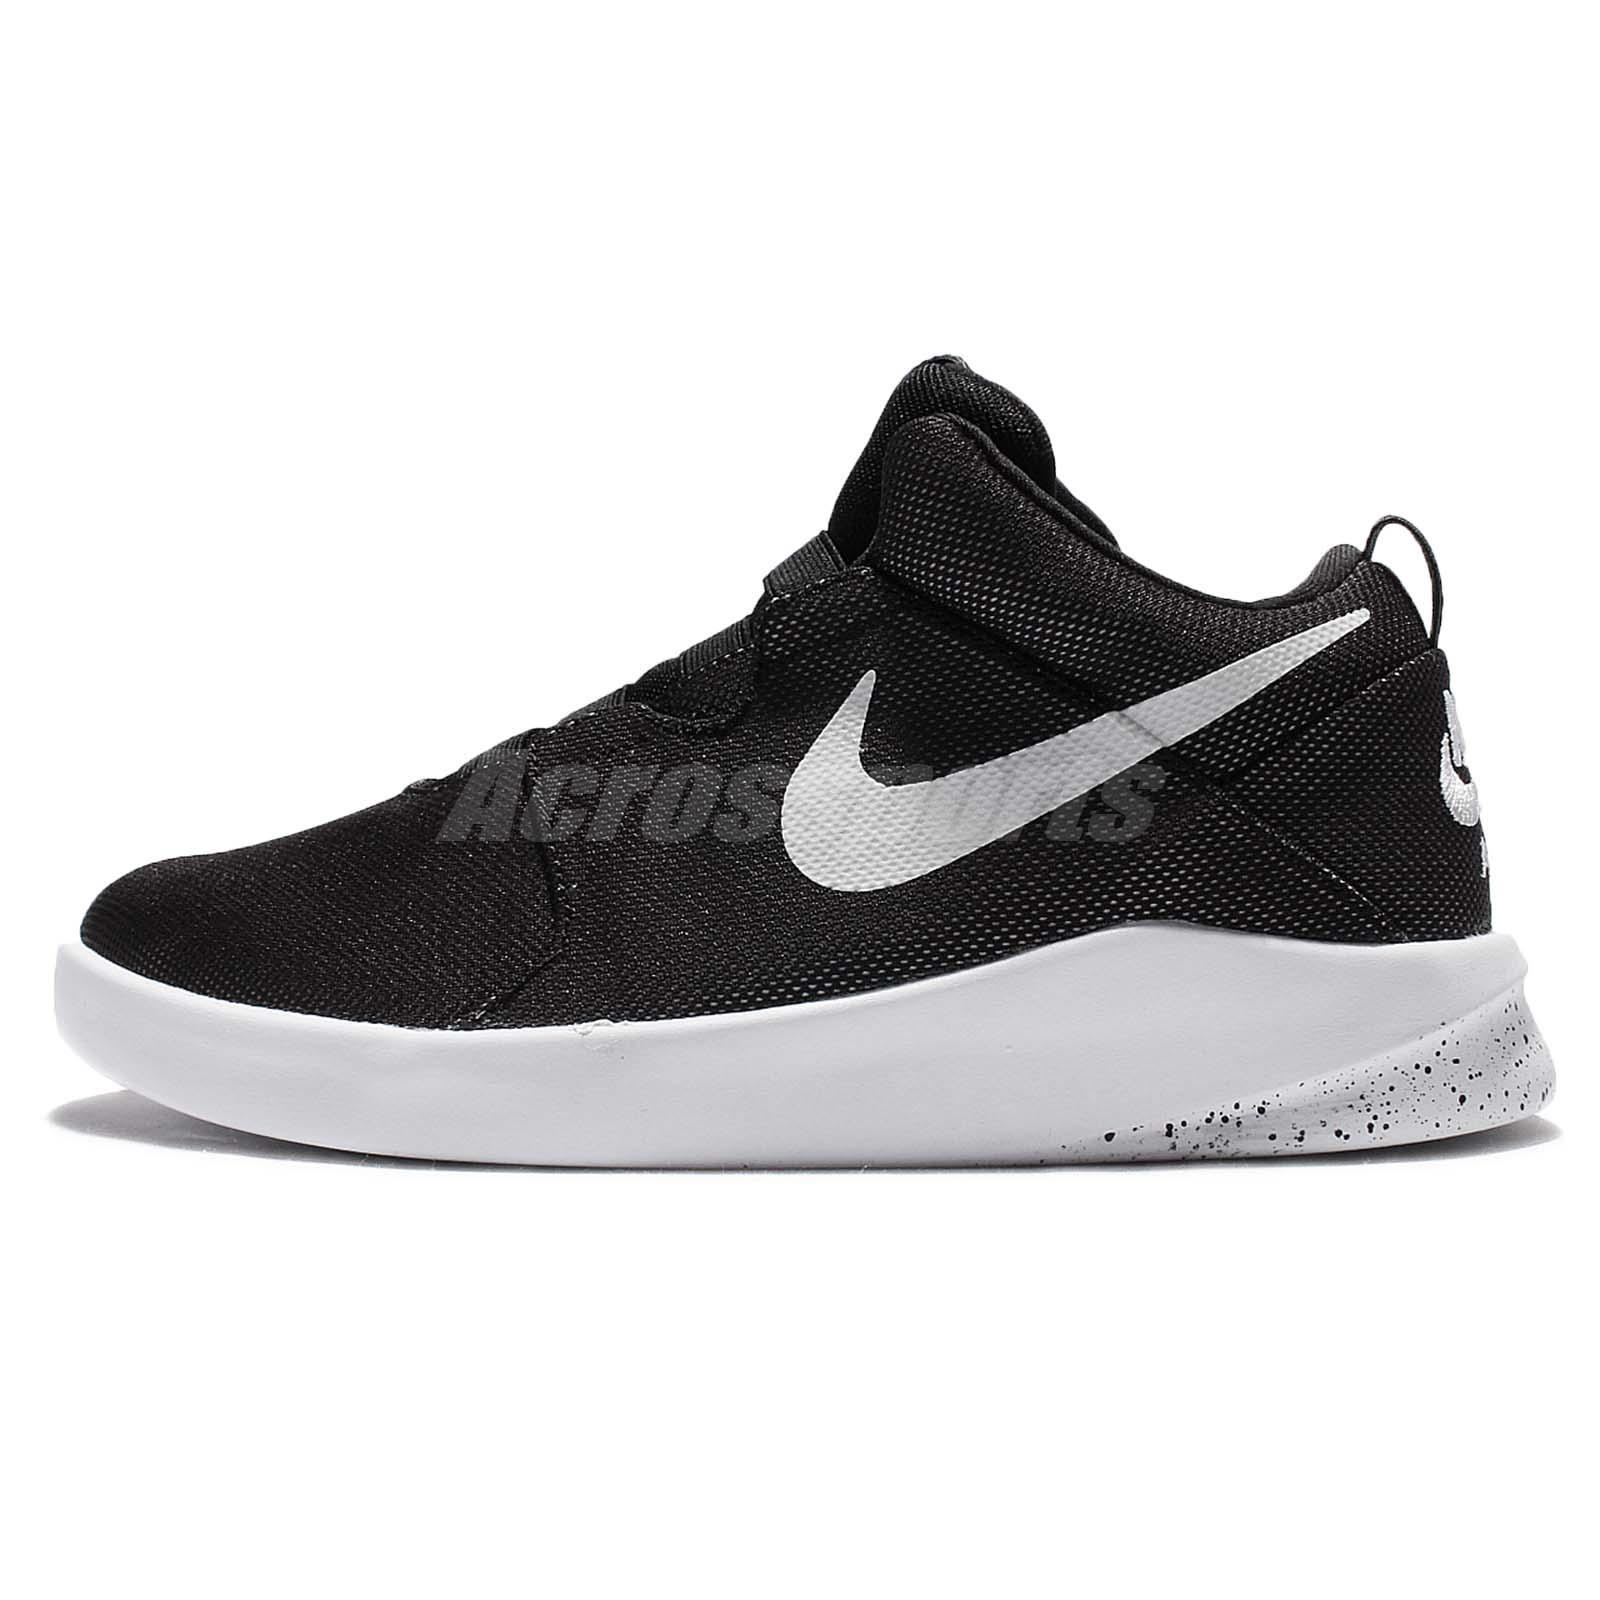 Nike Air Shibusa Black White Mens Casual Shoes Slip On ...